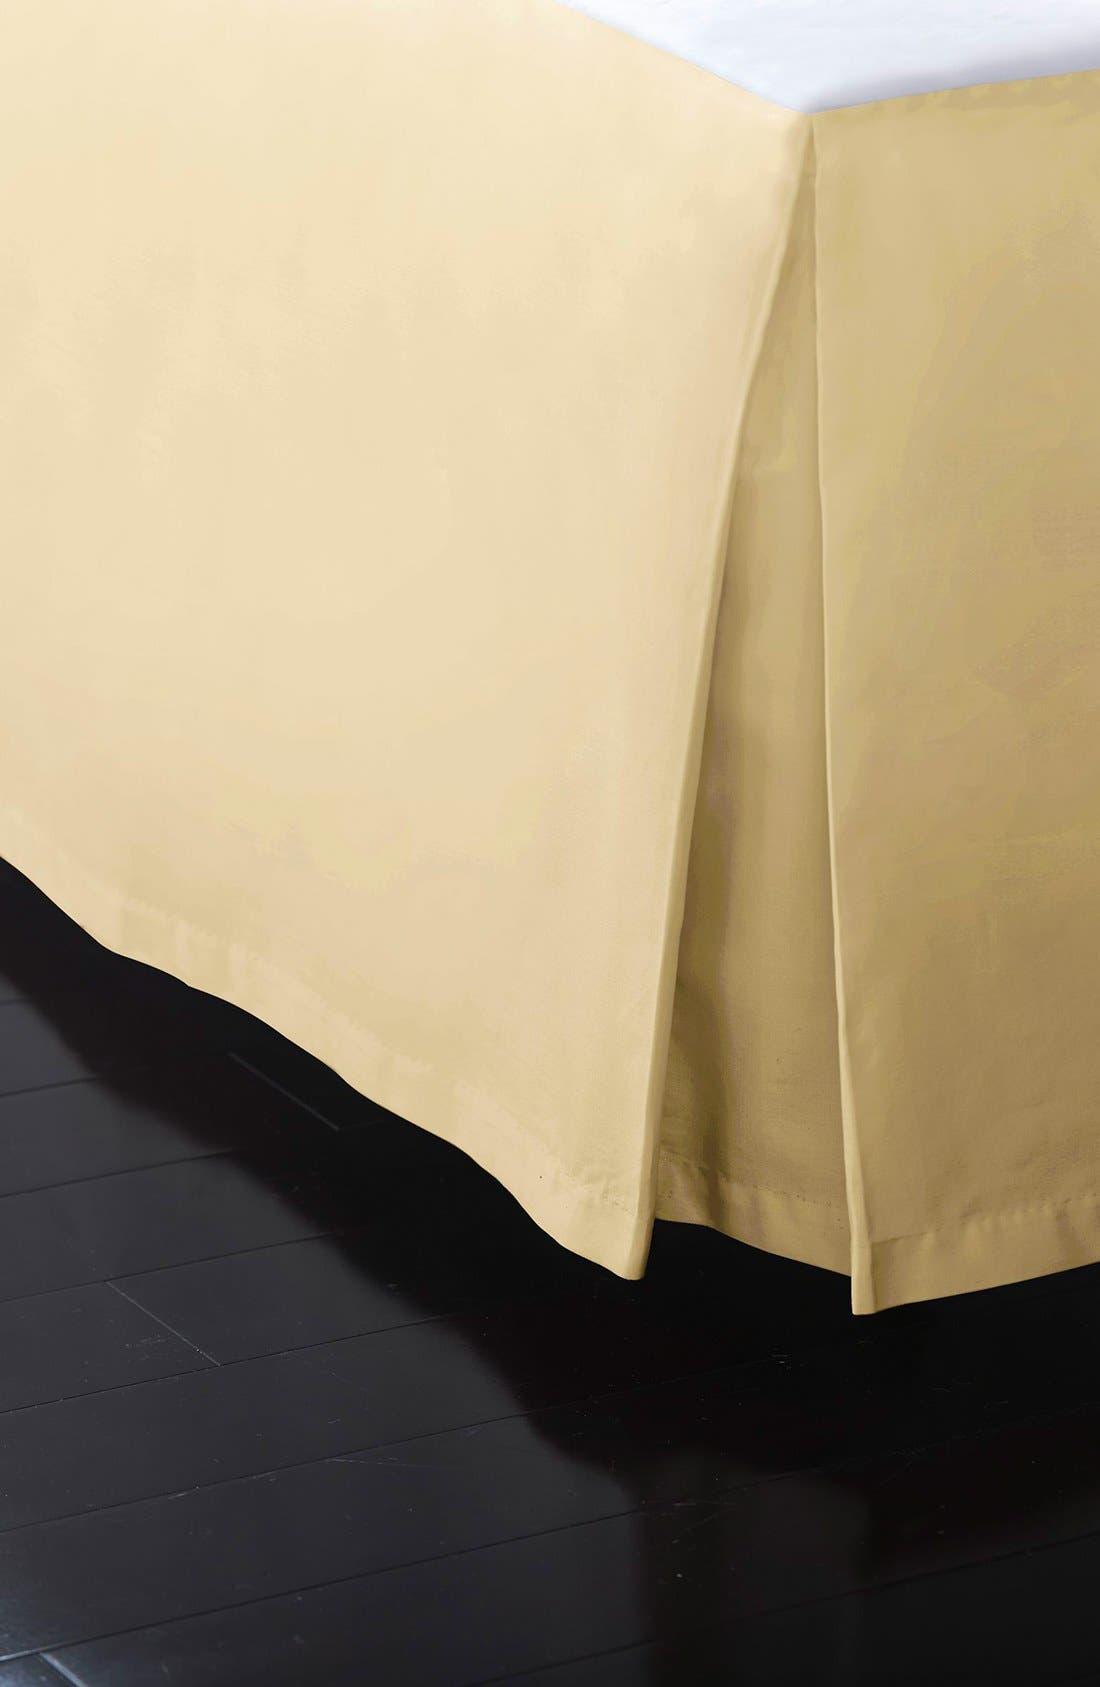 DONNA KARAN NEW YORK, Donna Karan Collection 'Reflection' 510 Thread Count Bed Skirt, Main thumbnail 1, color, GOLD DUST